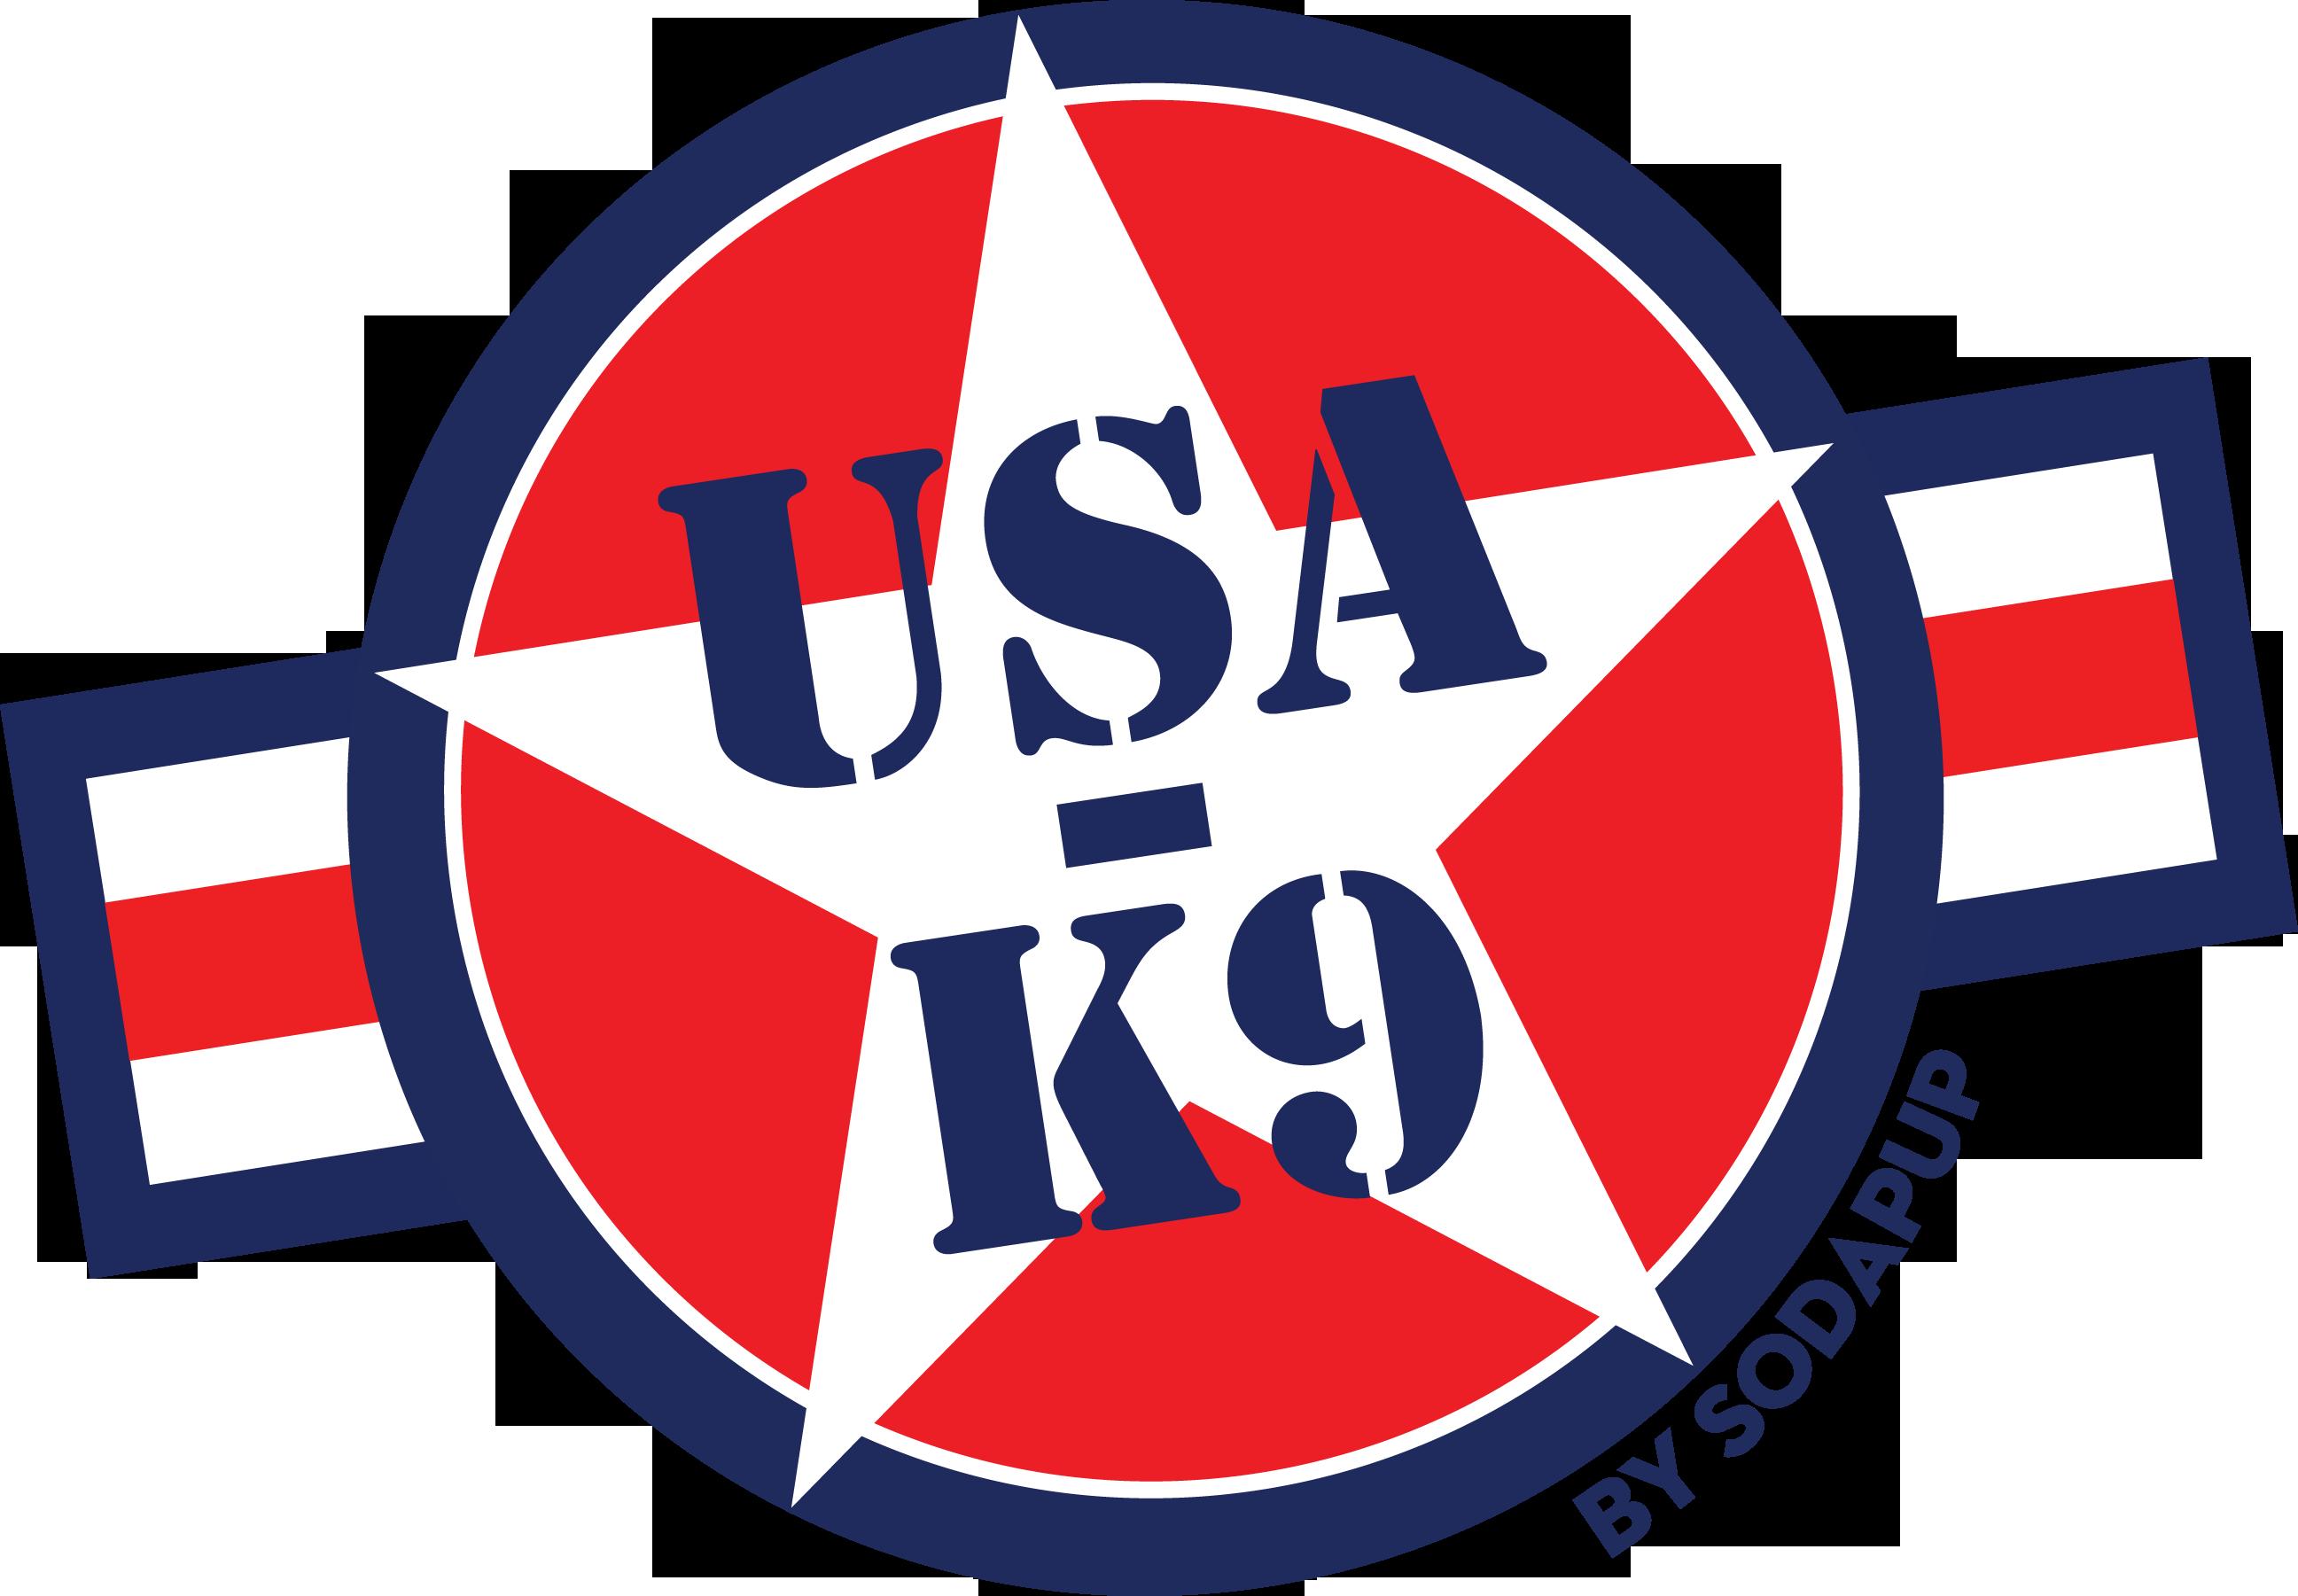 USA-K9 Logo Image